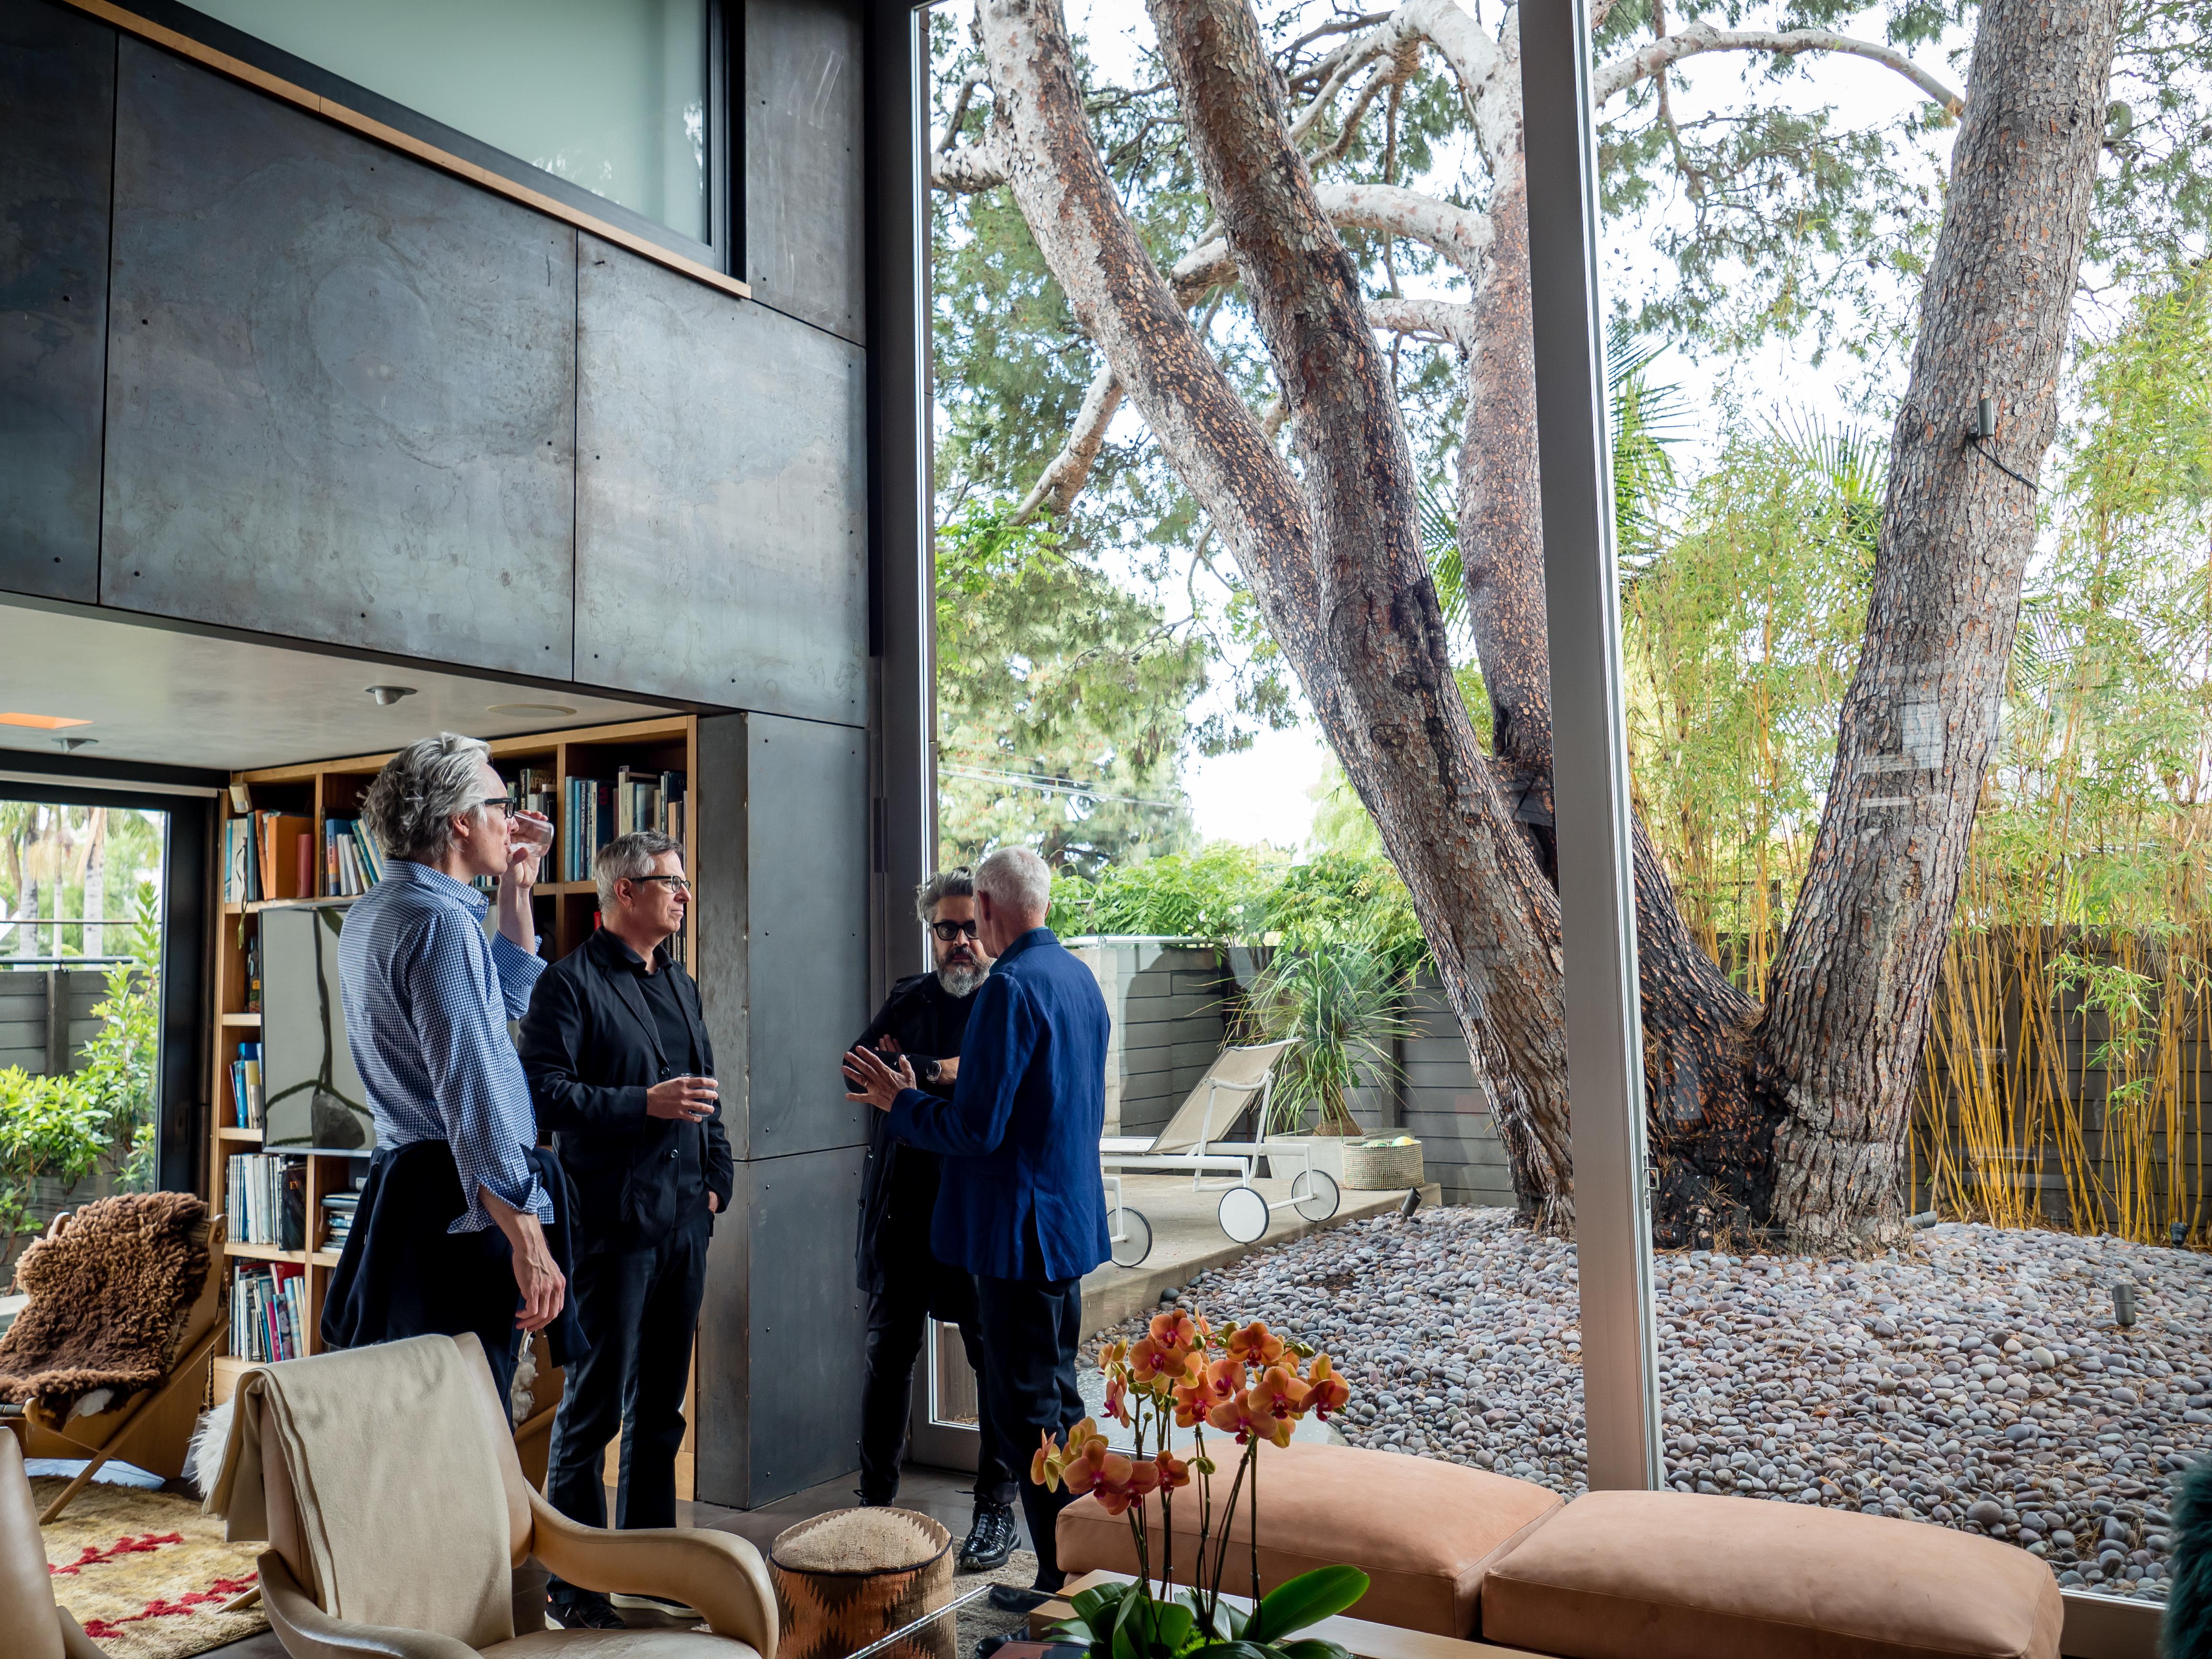 Shelley Kappe 90th birthday celebration male architects talking